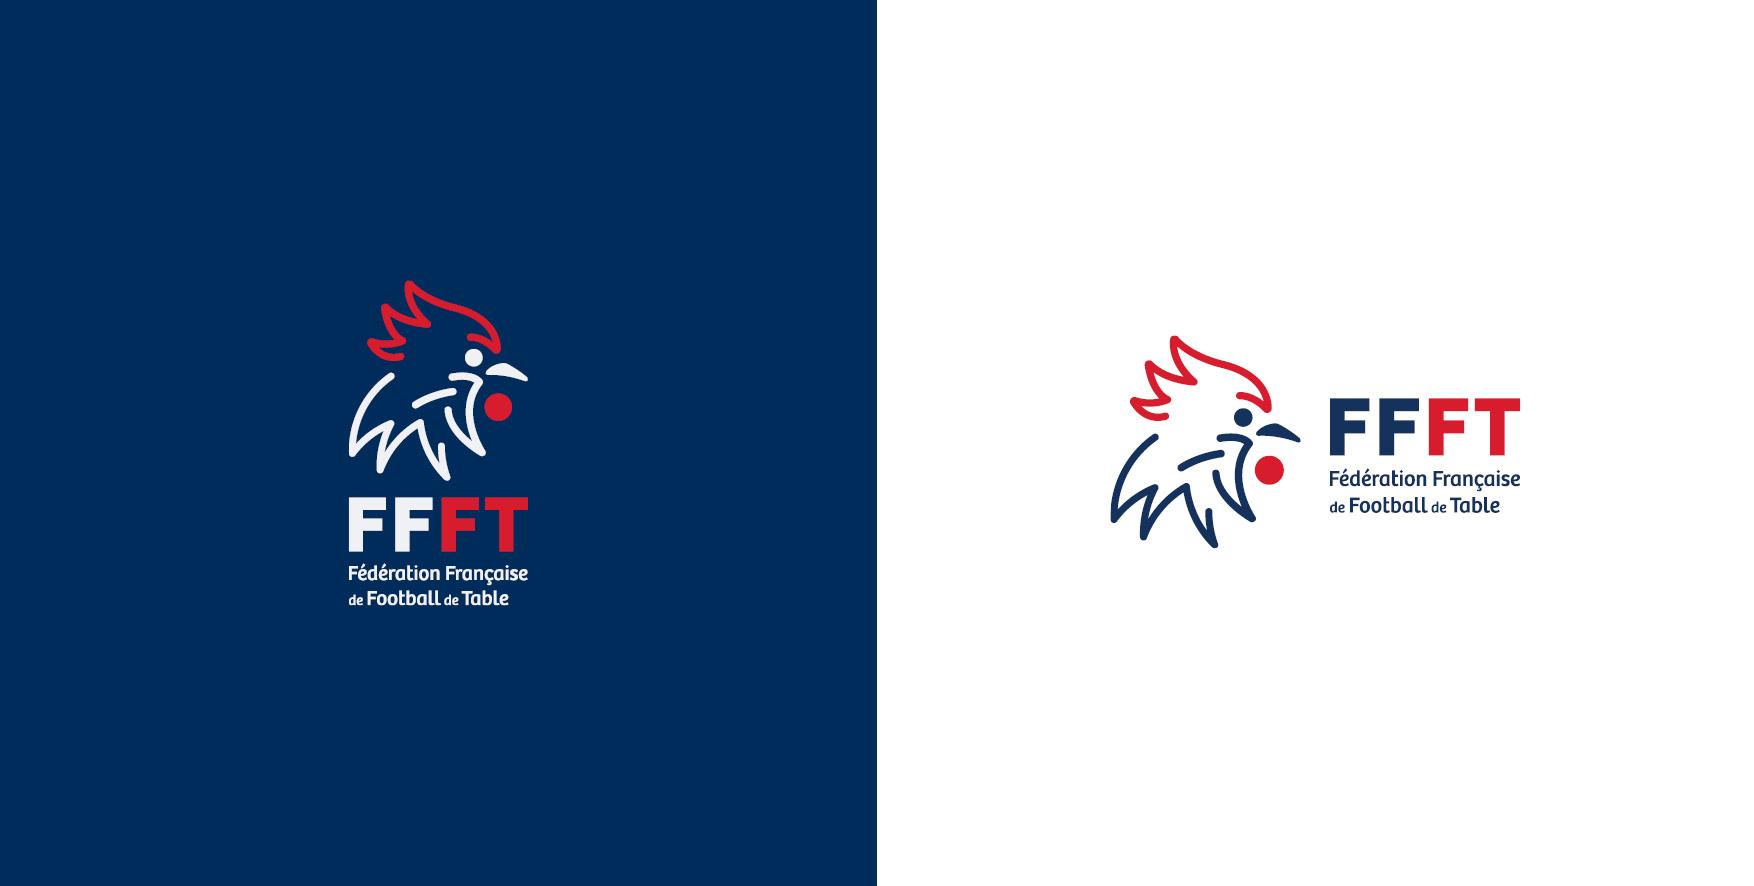 Ffft logotype vertical